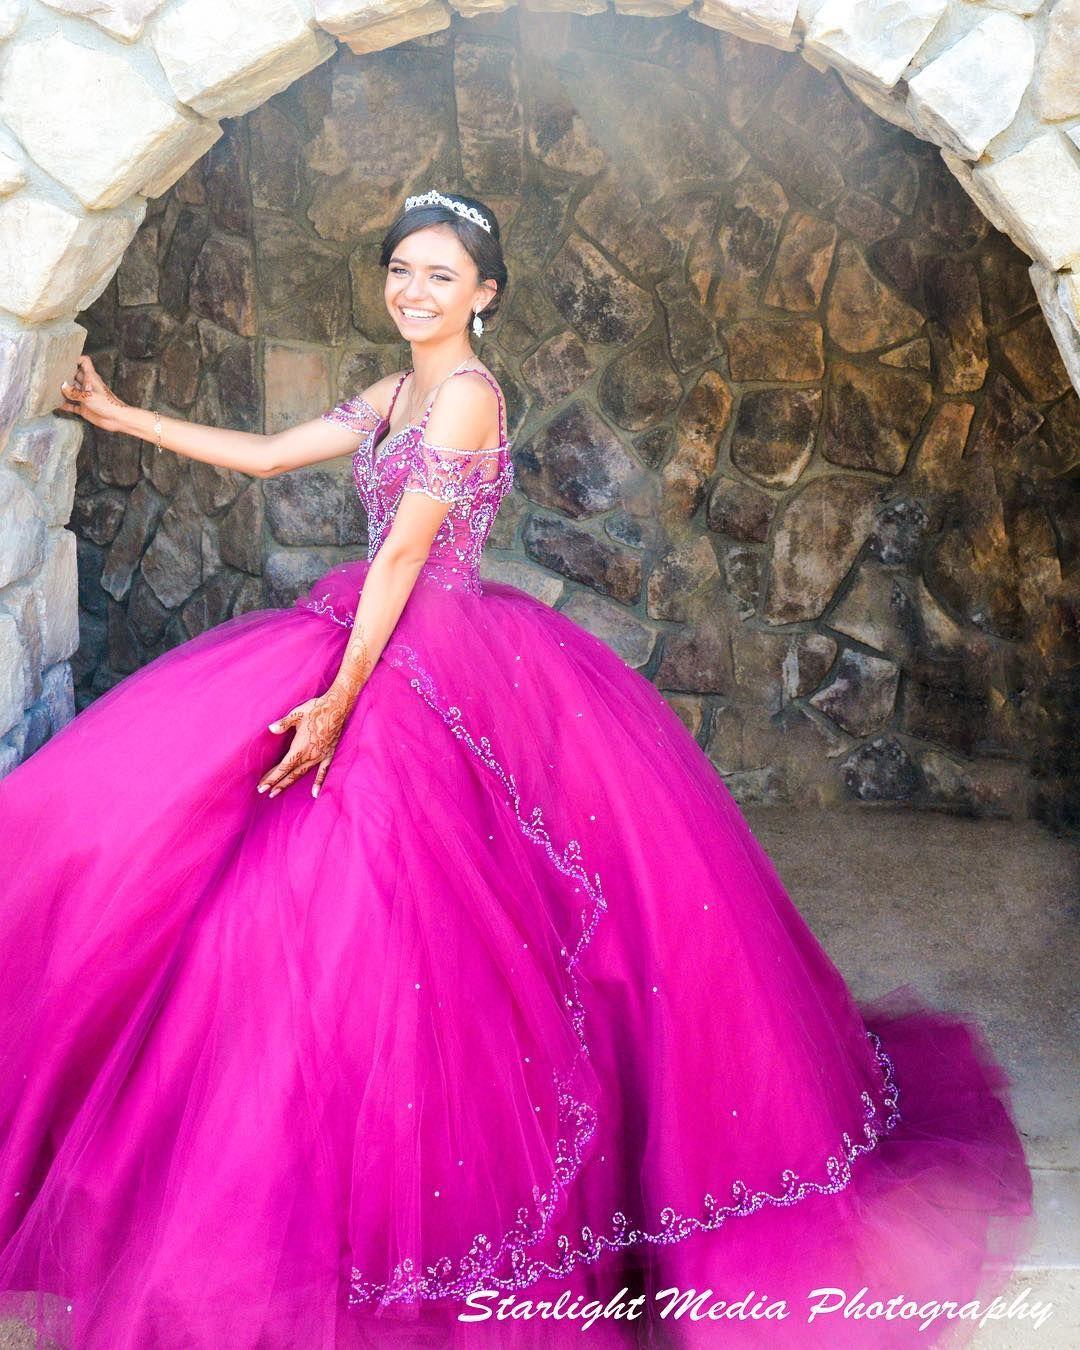 Princess #starlightmediaphoto #creatingmemories #capturethemoment ...